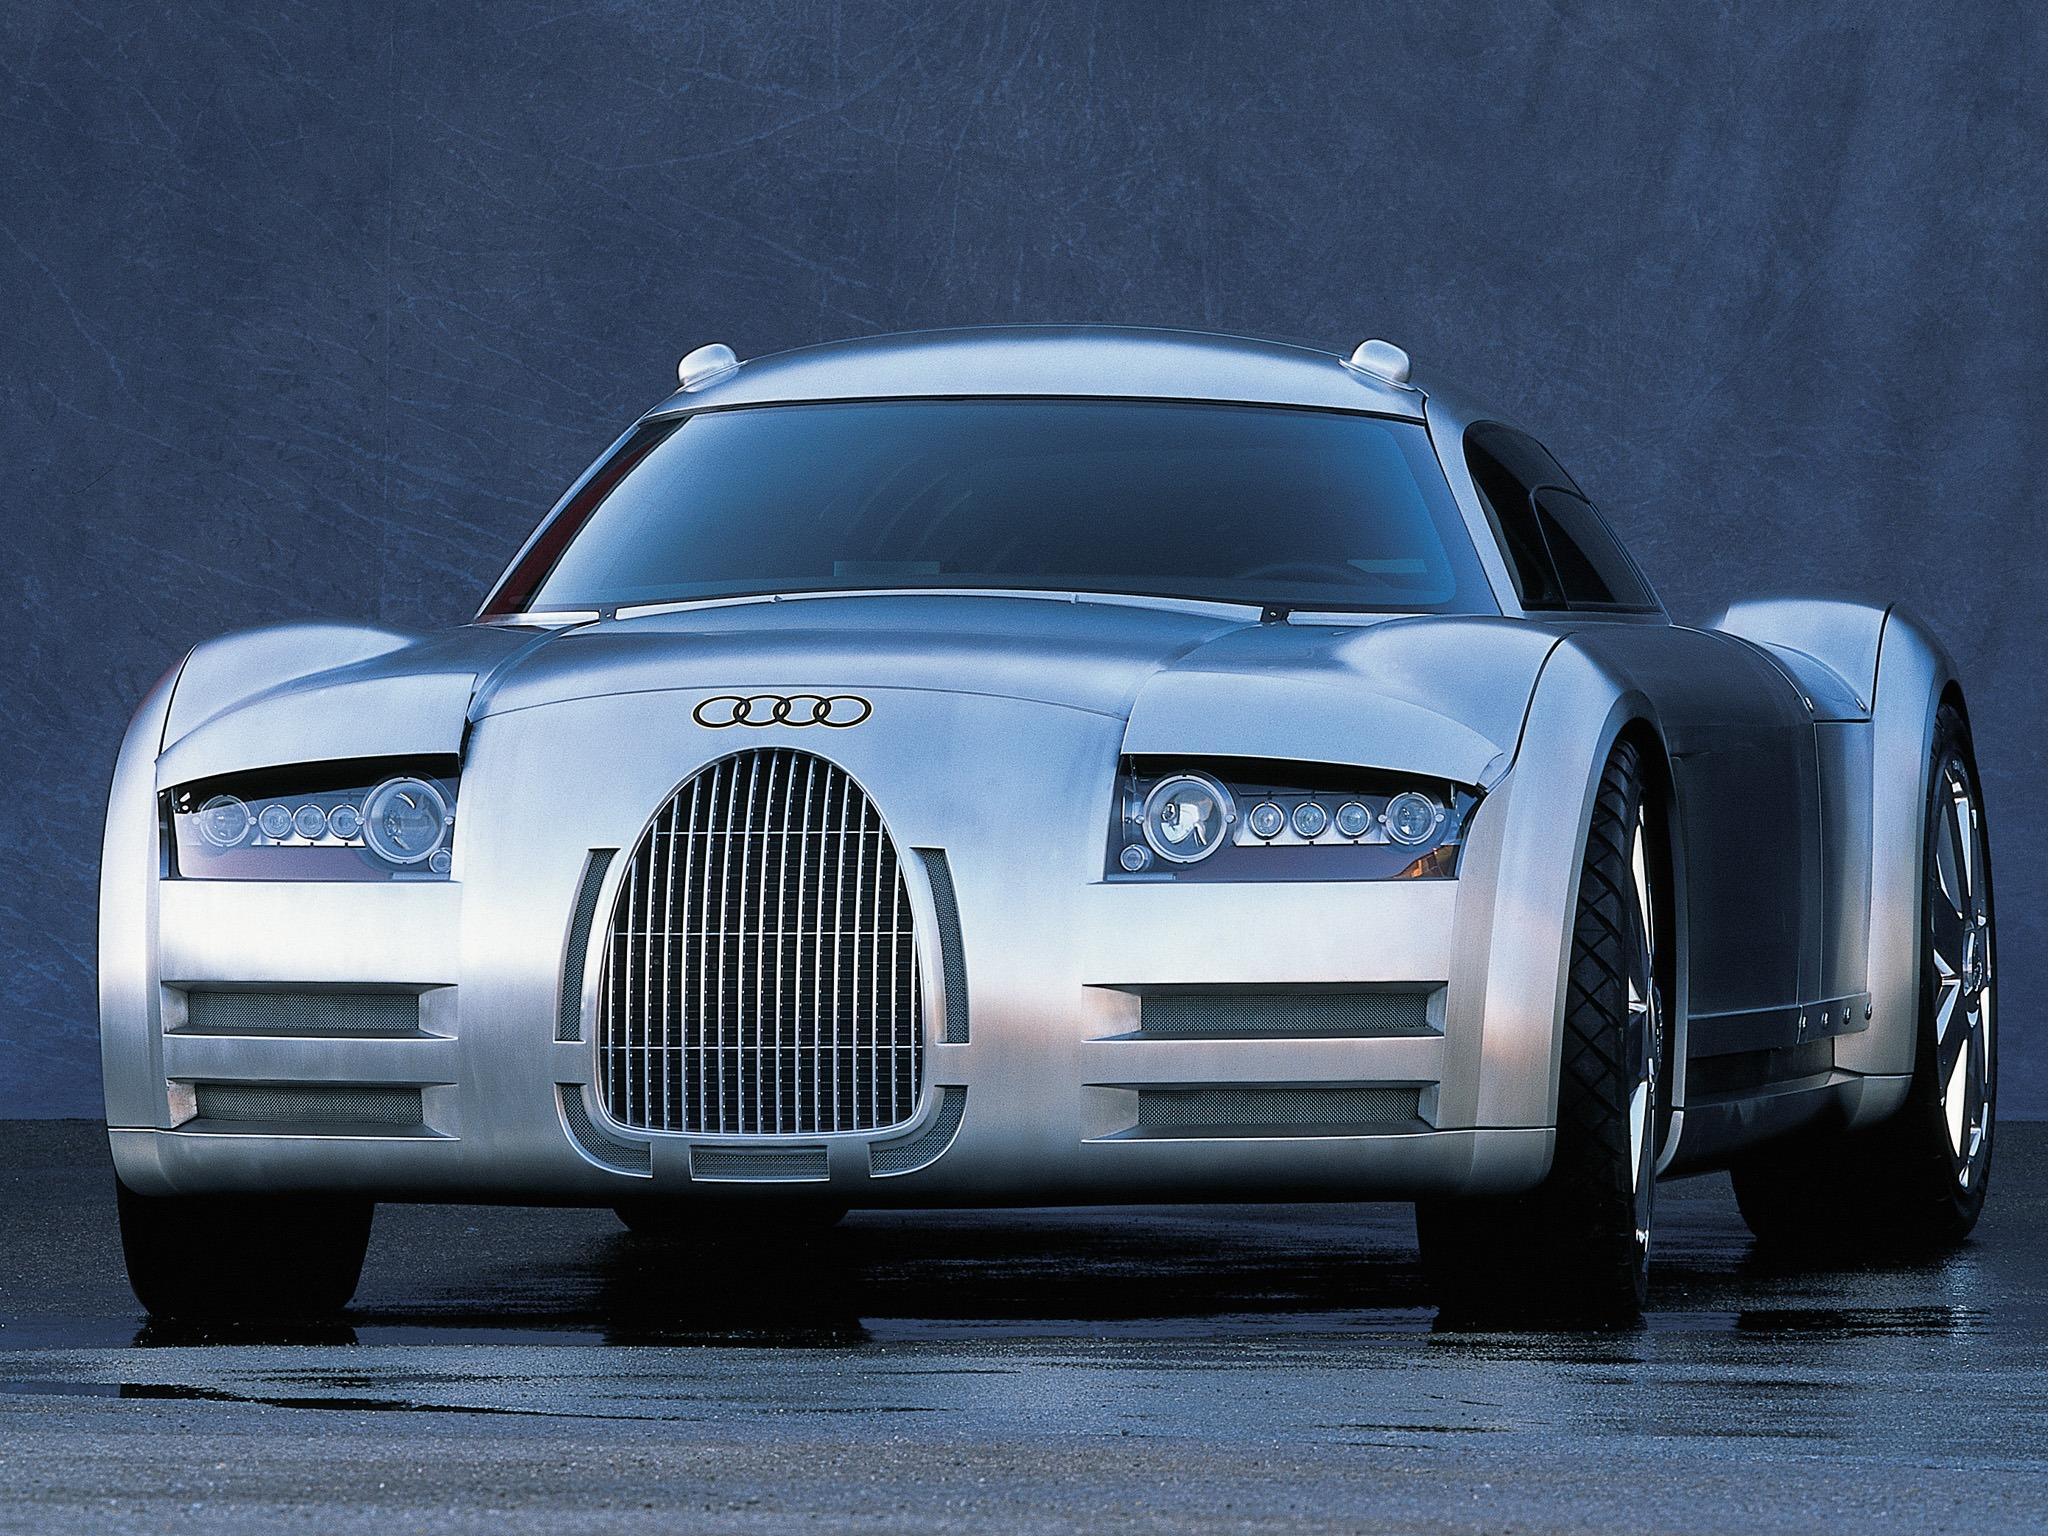 Audi Rosemeyer Concept (2000) - Old Concept Cars